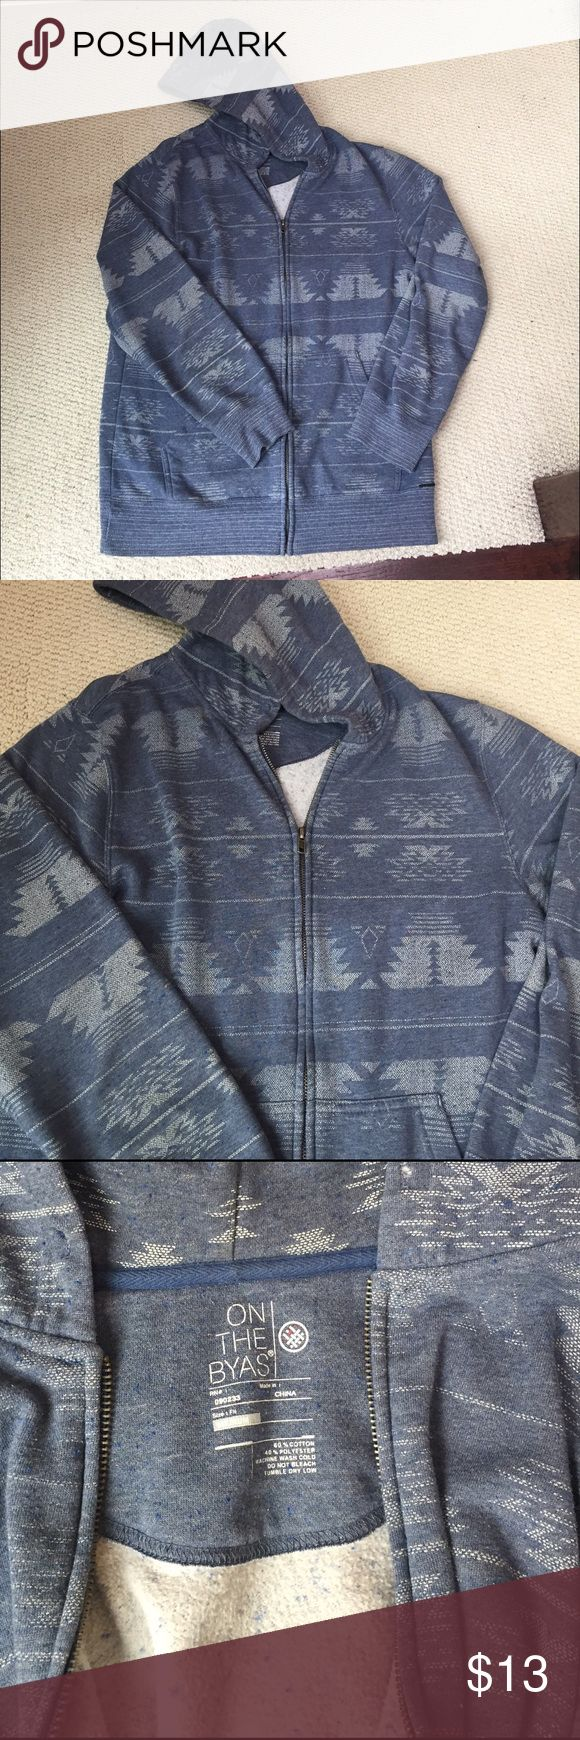 Men's On The Byas zip up hoodie Gently used zip up hoodie. Size medium. Aztec design. No strings for the hood. on the byas Sweaters Zip Up